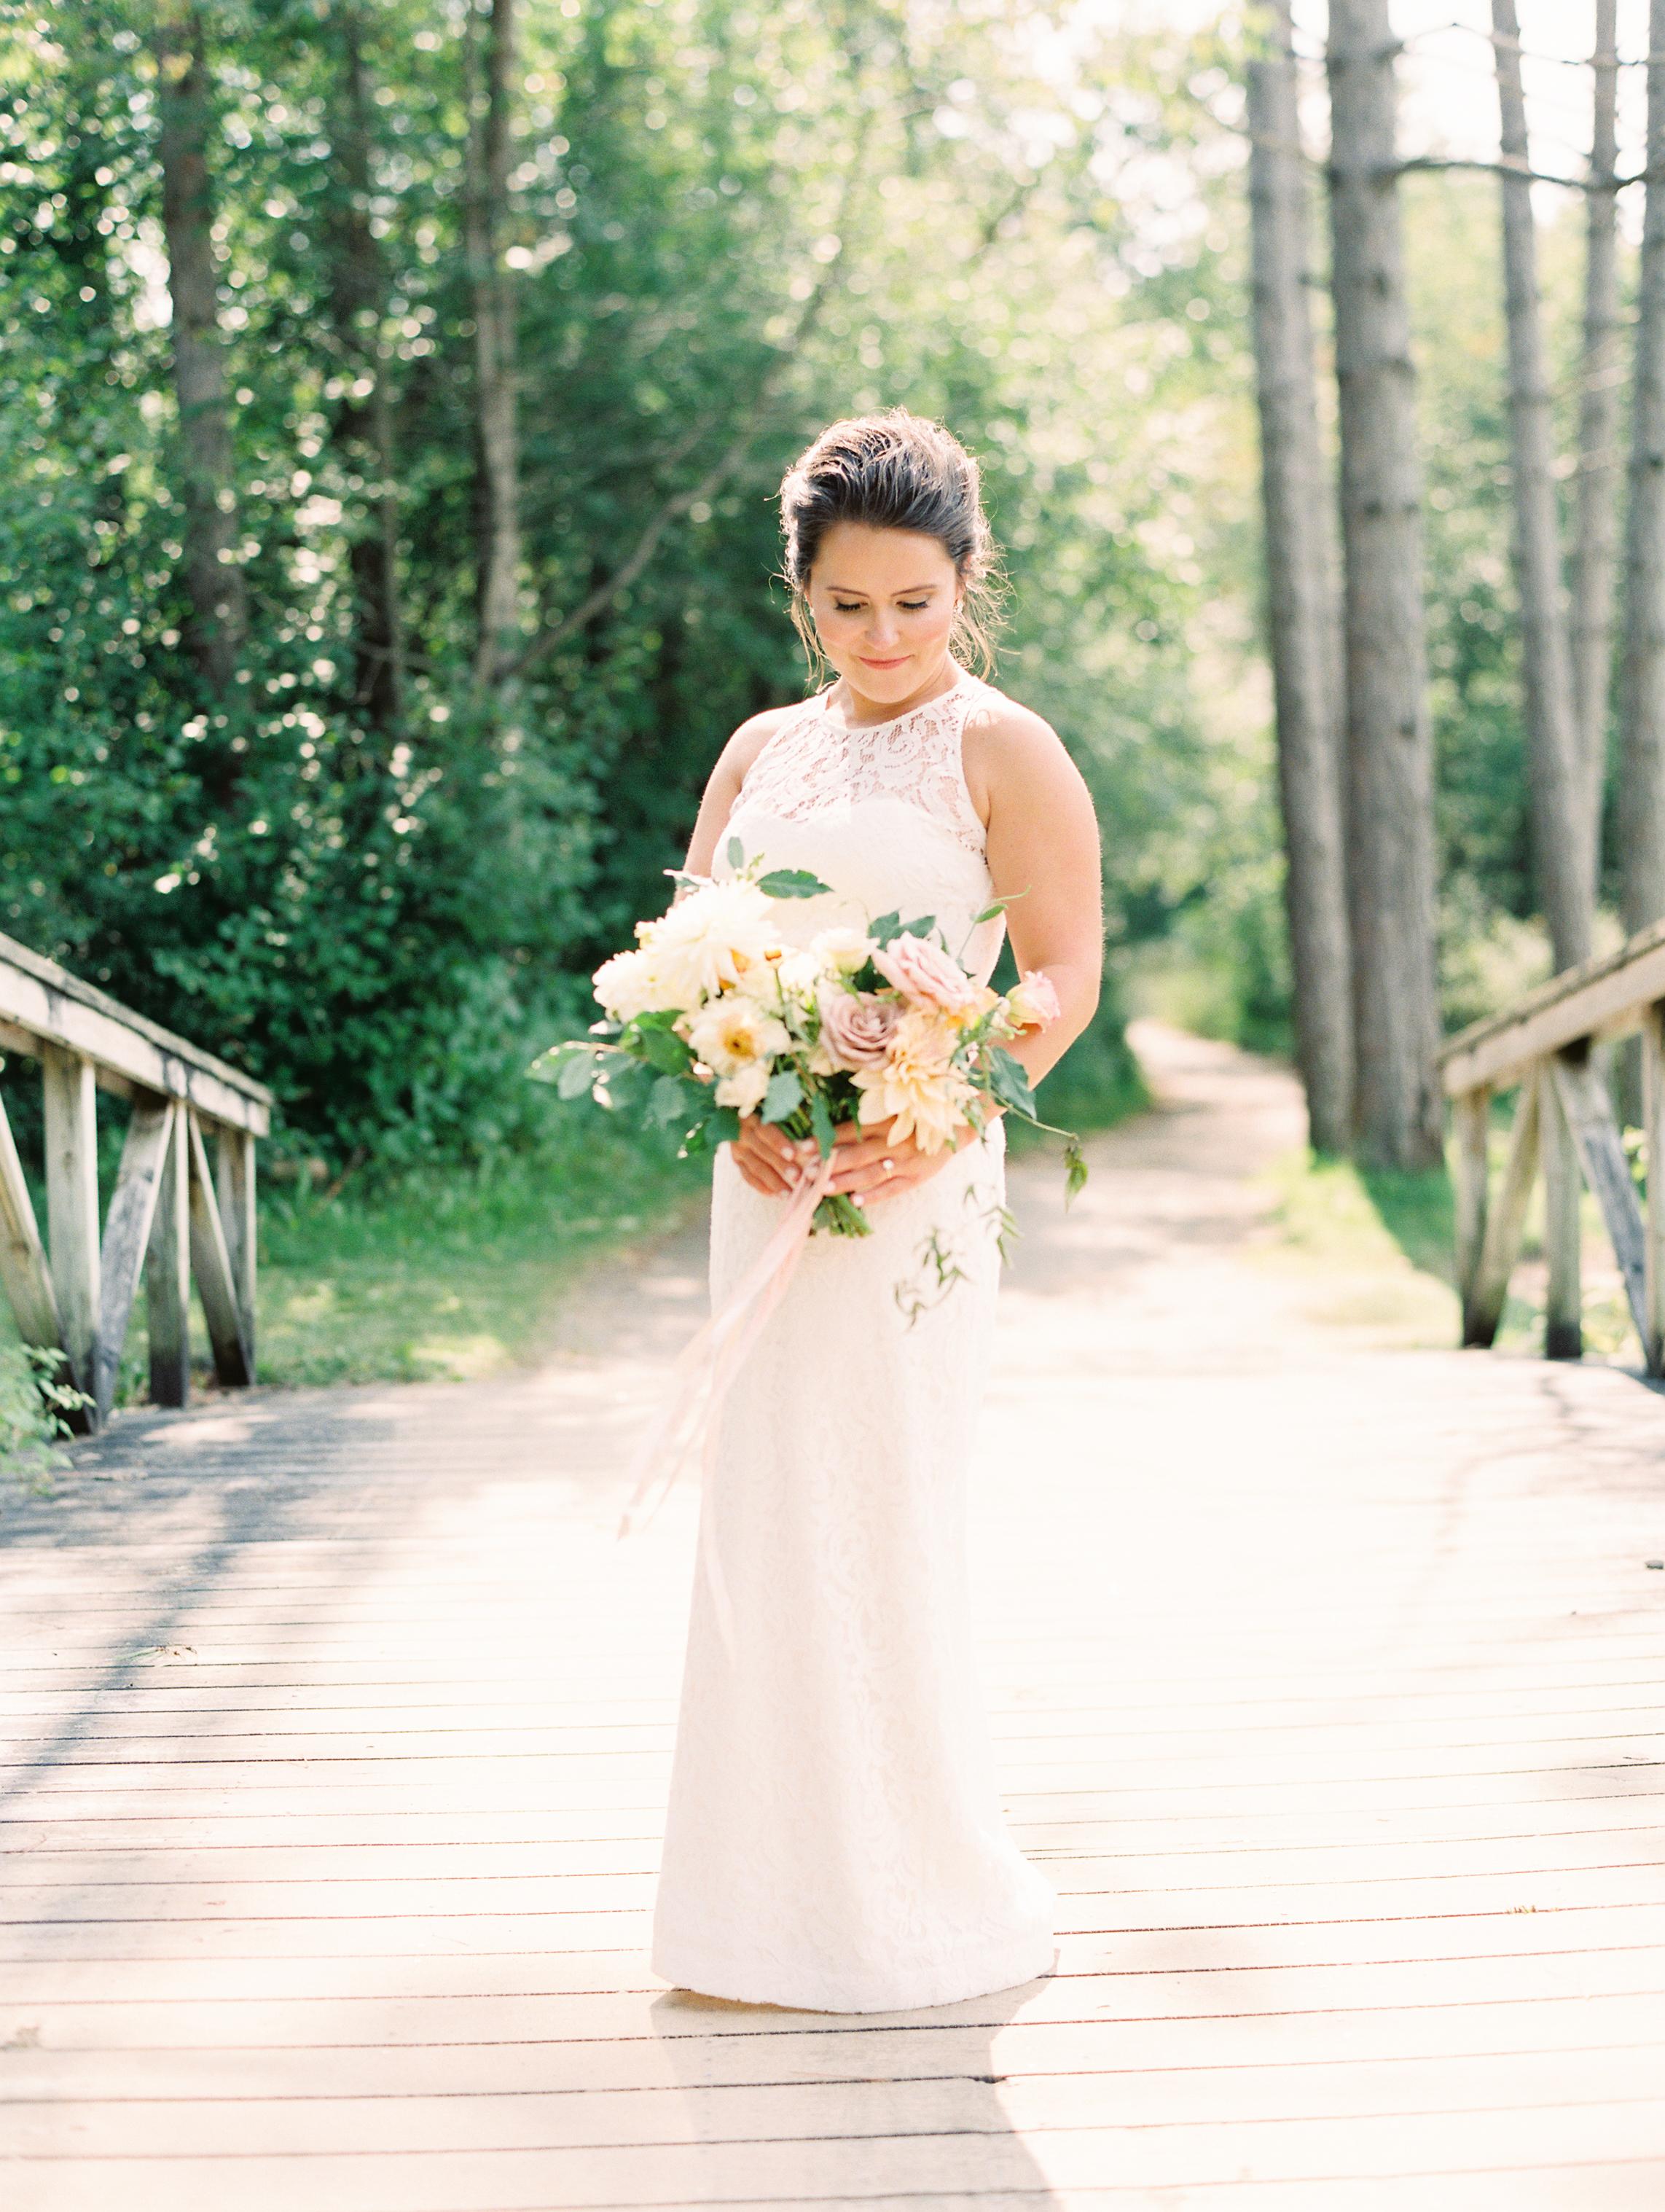 Zoller+Wedding+Bridal+Partyf-30.jpg